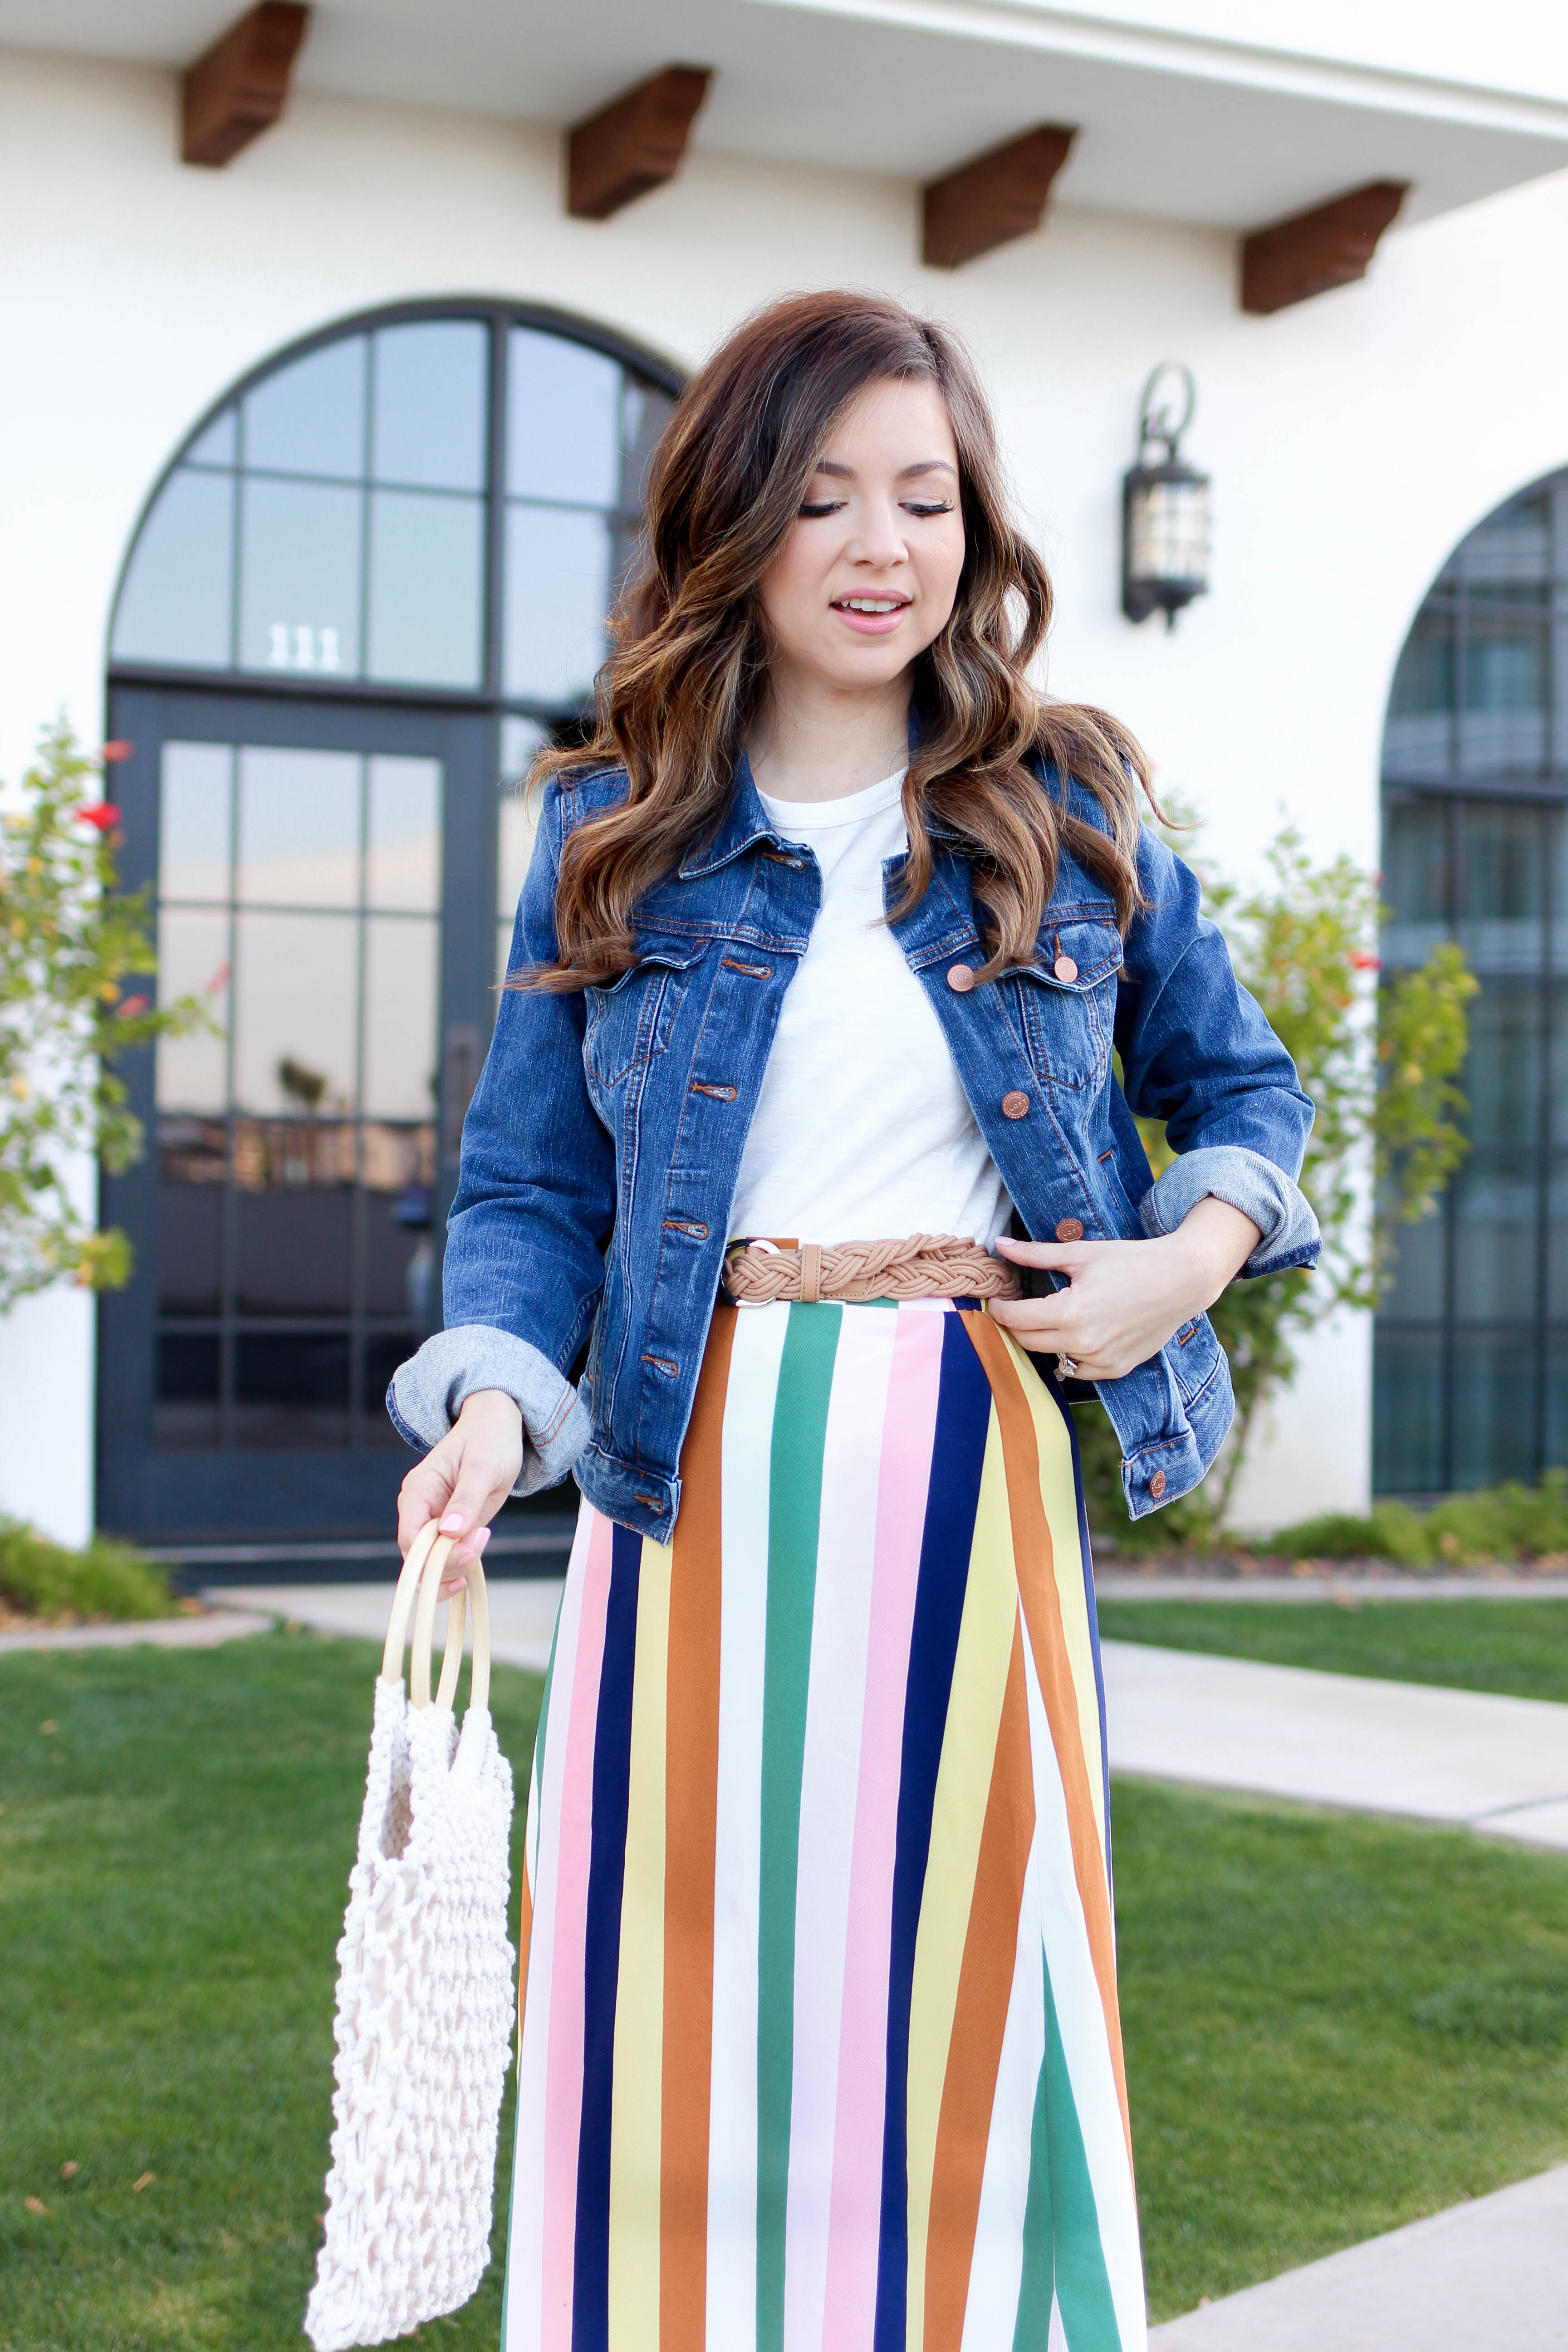 Multi color striped skirt